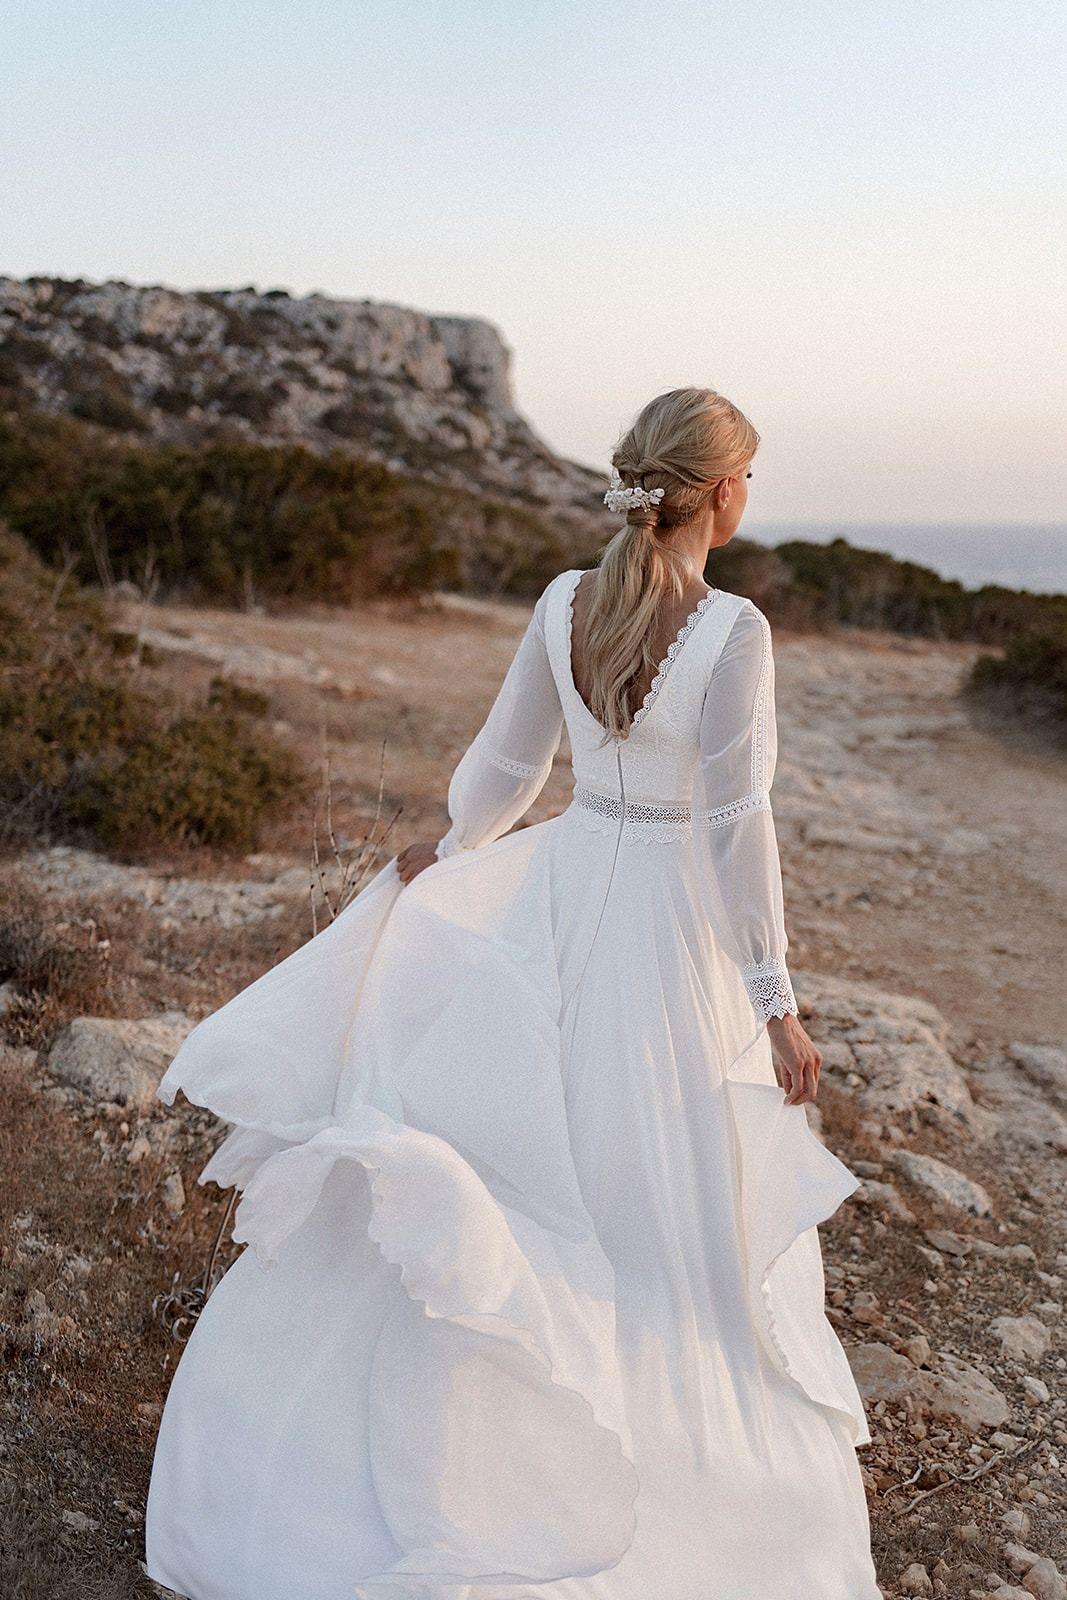 Suknia Slubna Prosta Merida I Kolekcja 2020 2021 Sukien Slubnych Dama Couture Dresses Lace Dress Wedding Dresses